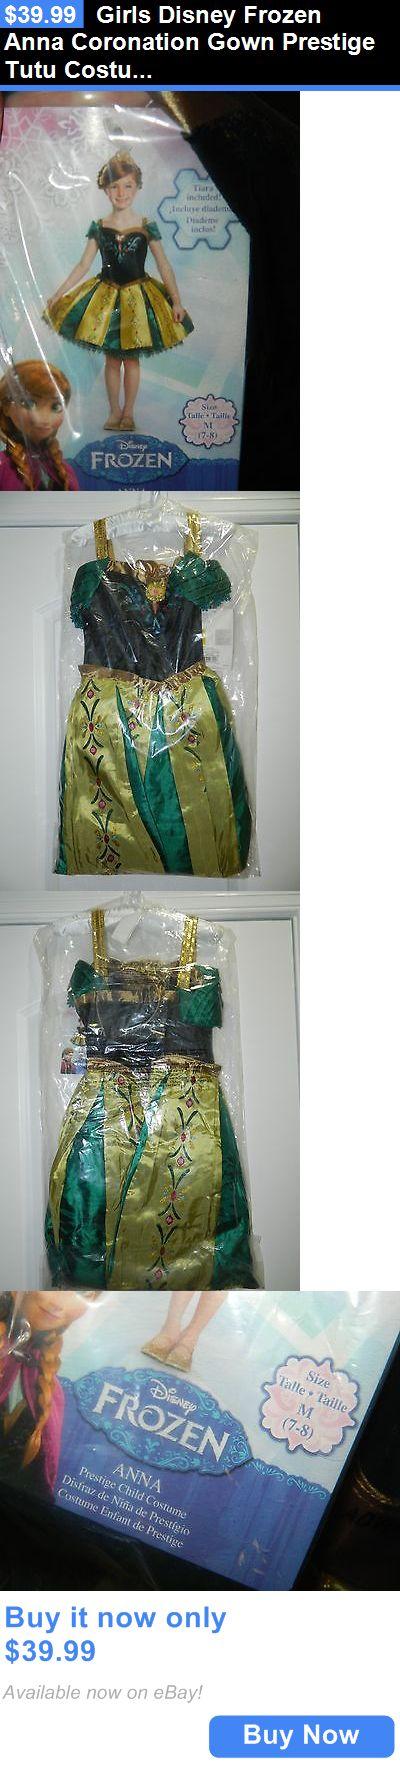 Kids Costumes: Girls Disney Frozen Anna Coronation Gown Prestige Tutu Costume Sz M 7/8 New! BUY IT NOW ONLY: $39.99